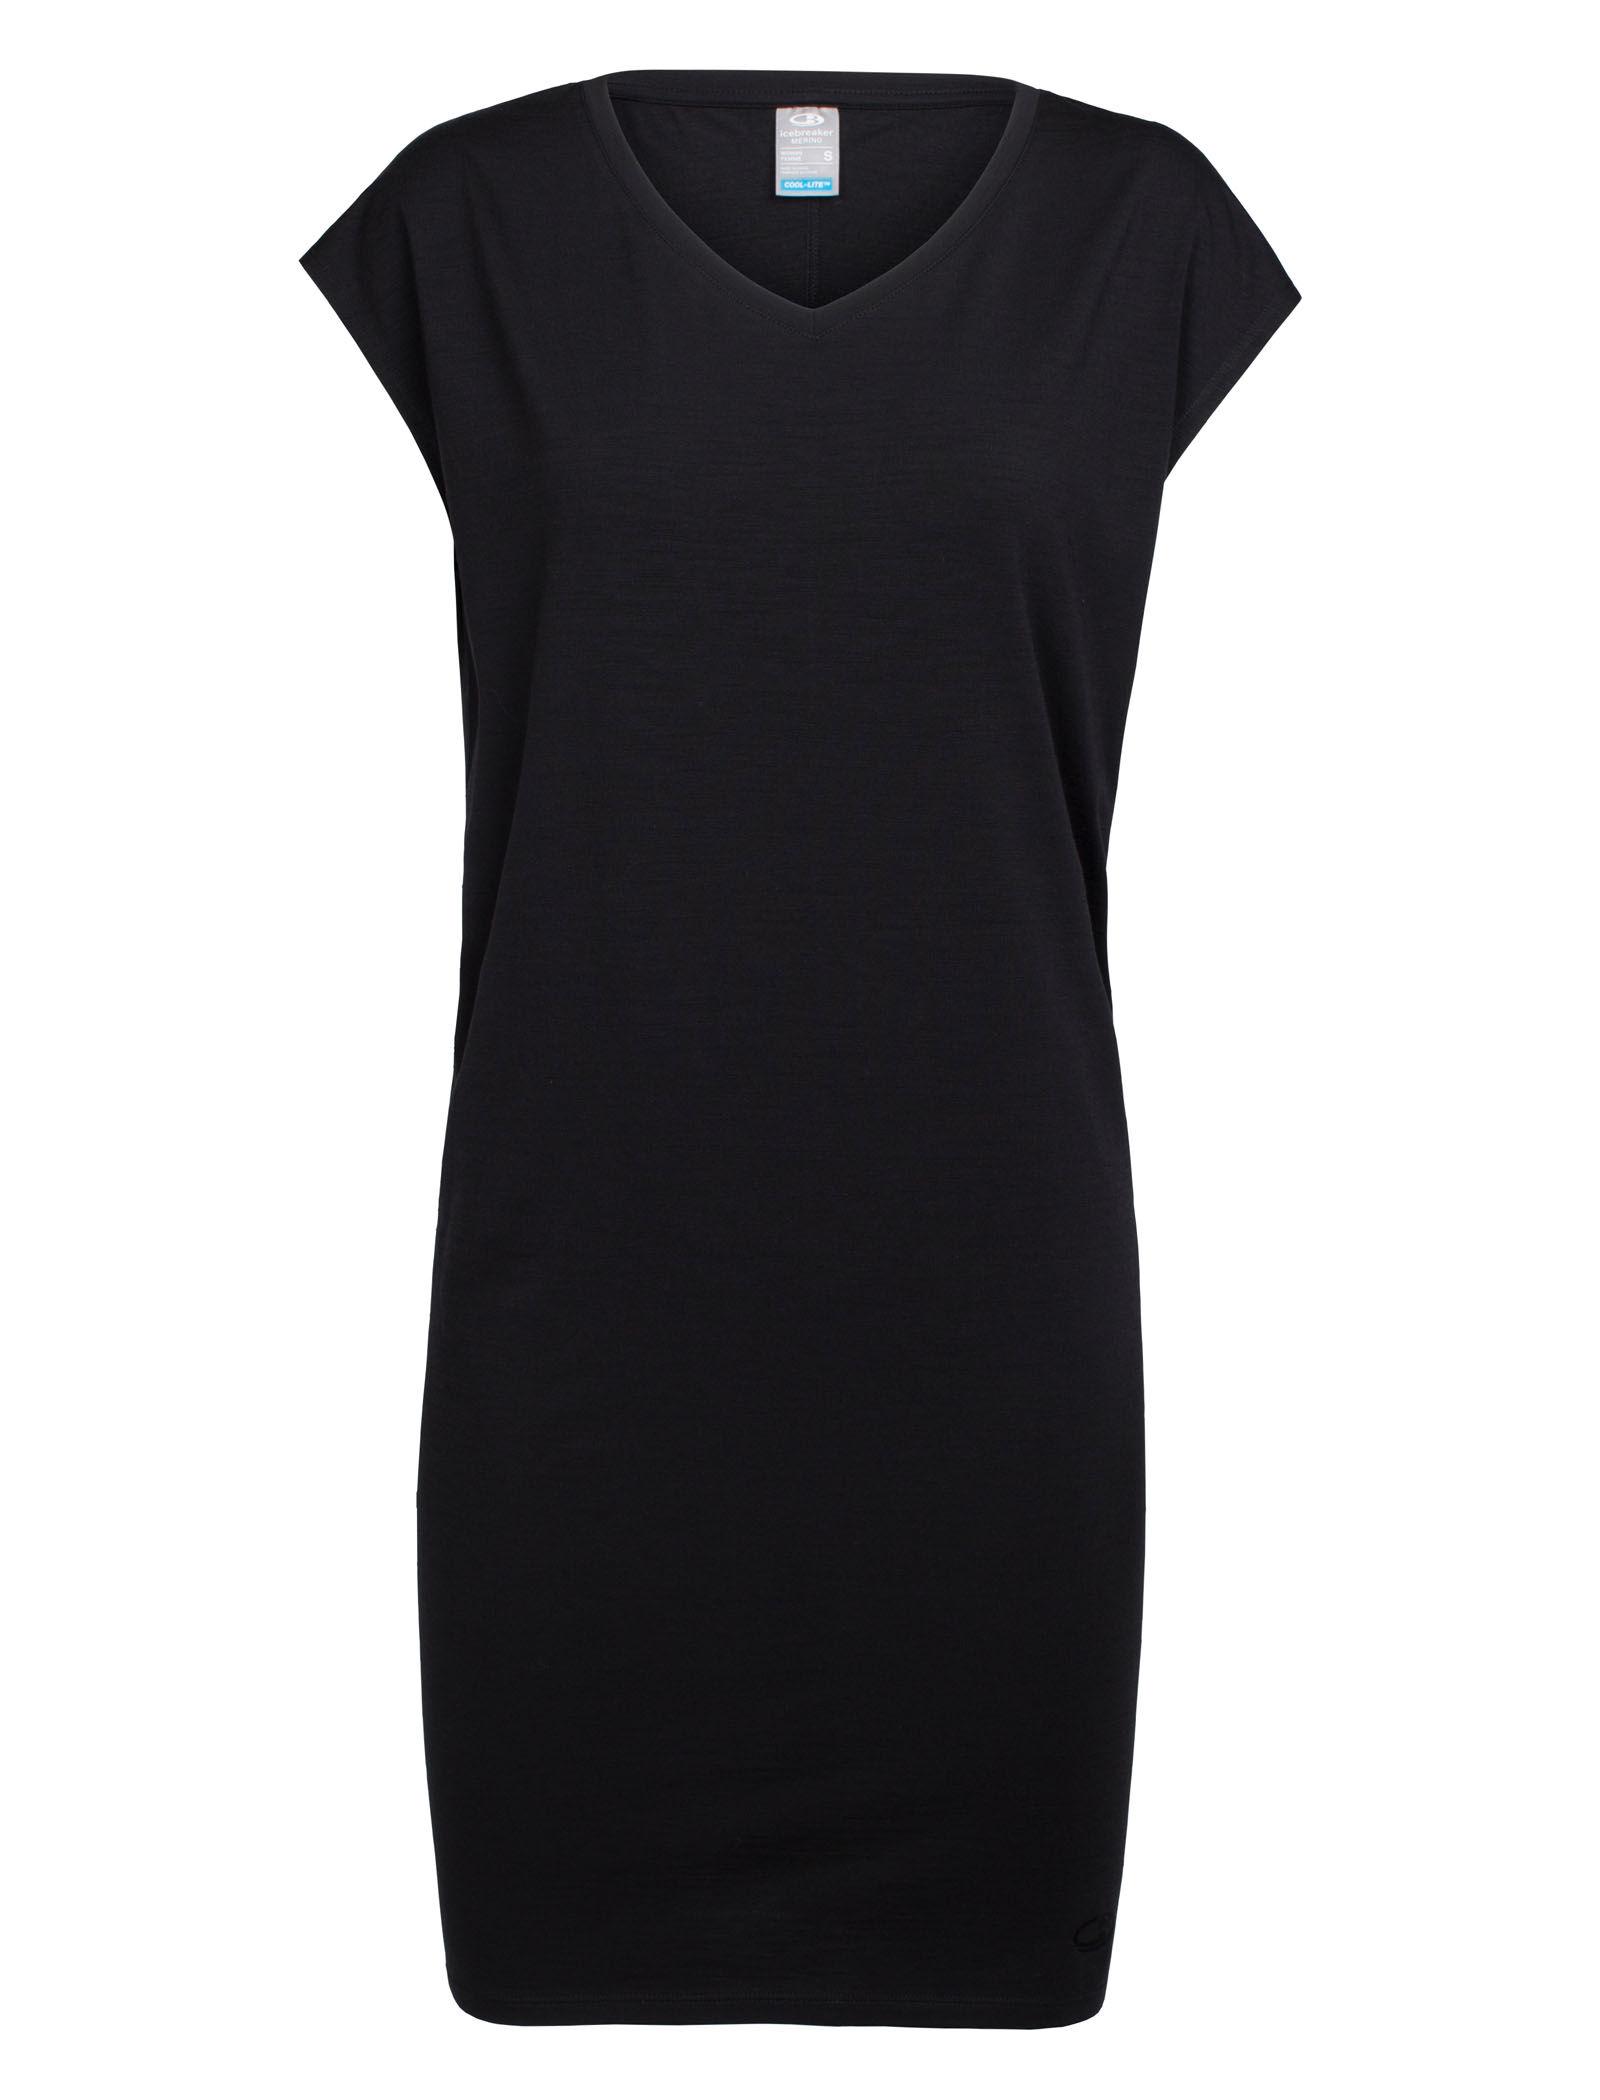 Cool Lite™ Dress Yanni Tee 6Y7gyvbf